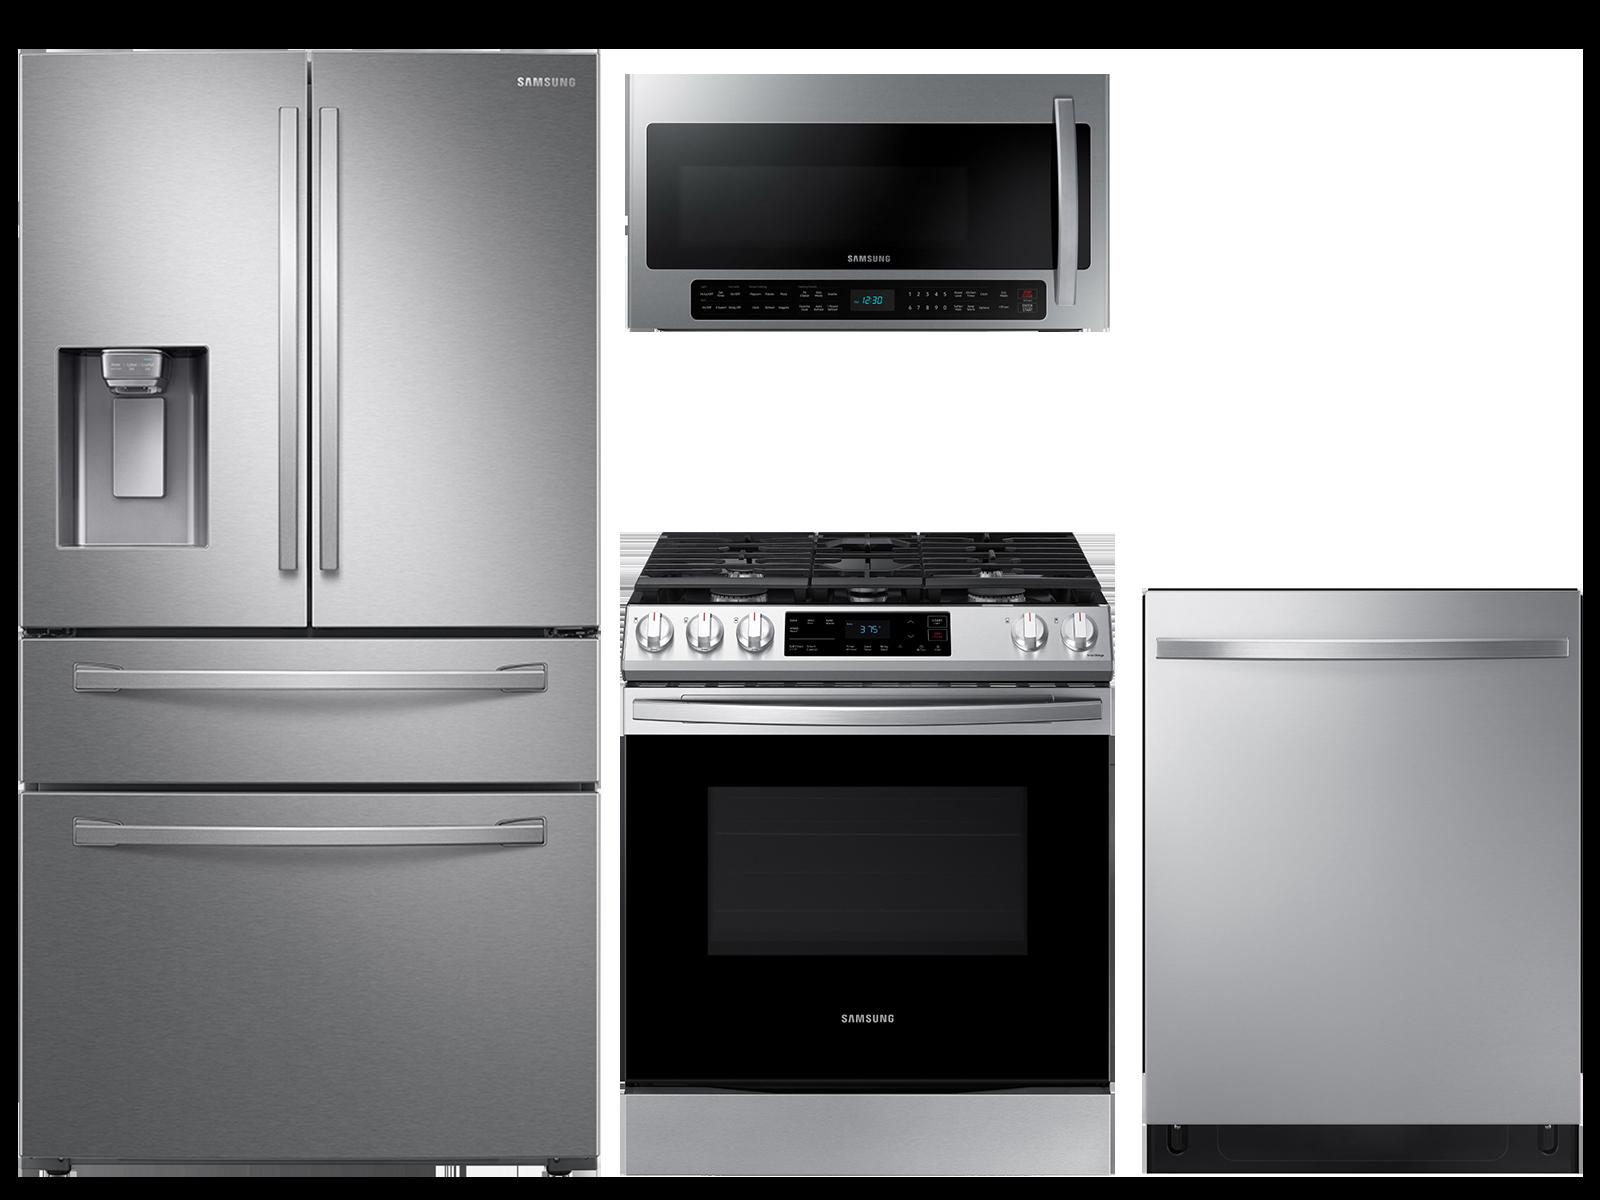 23 cu. ft. counter depth 4-door refrigerator, 6.0 cu. ft. gas range, 2.1 cu. ft. microwave and 48 dBA modern-look dishwasher package